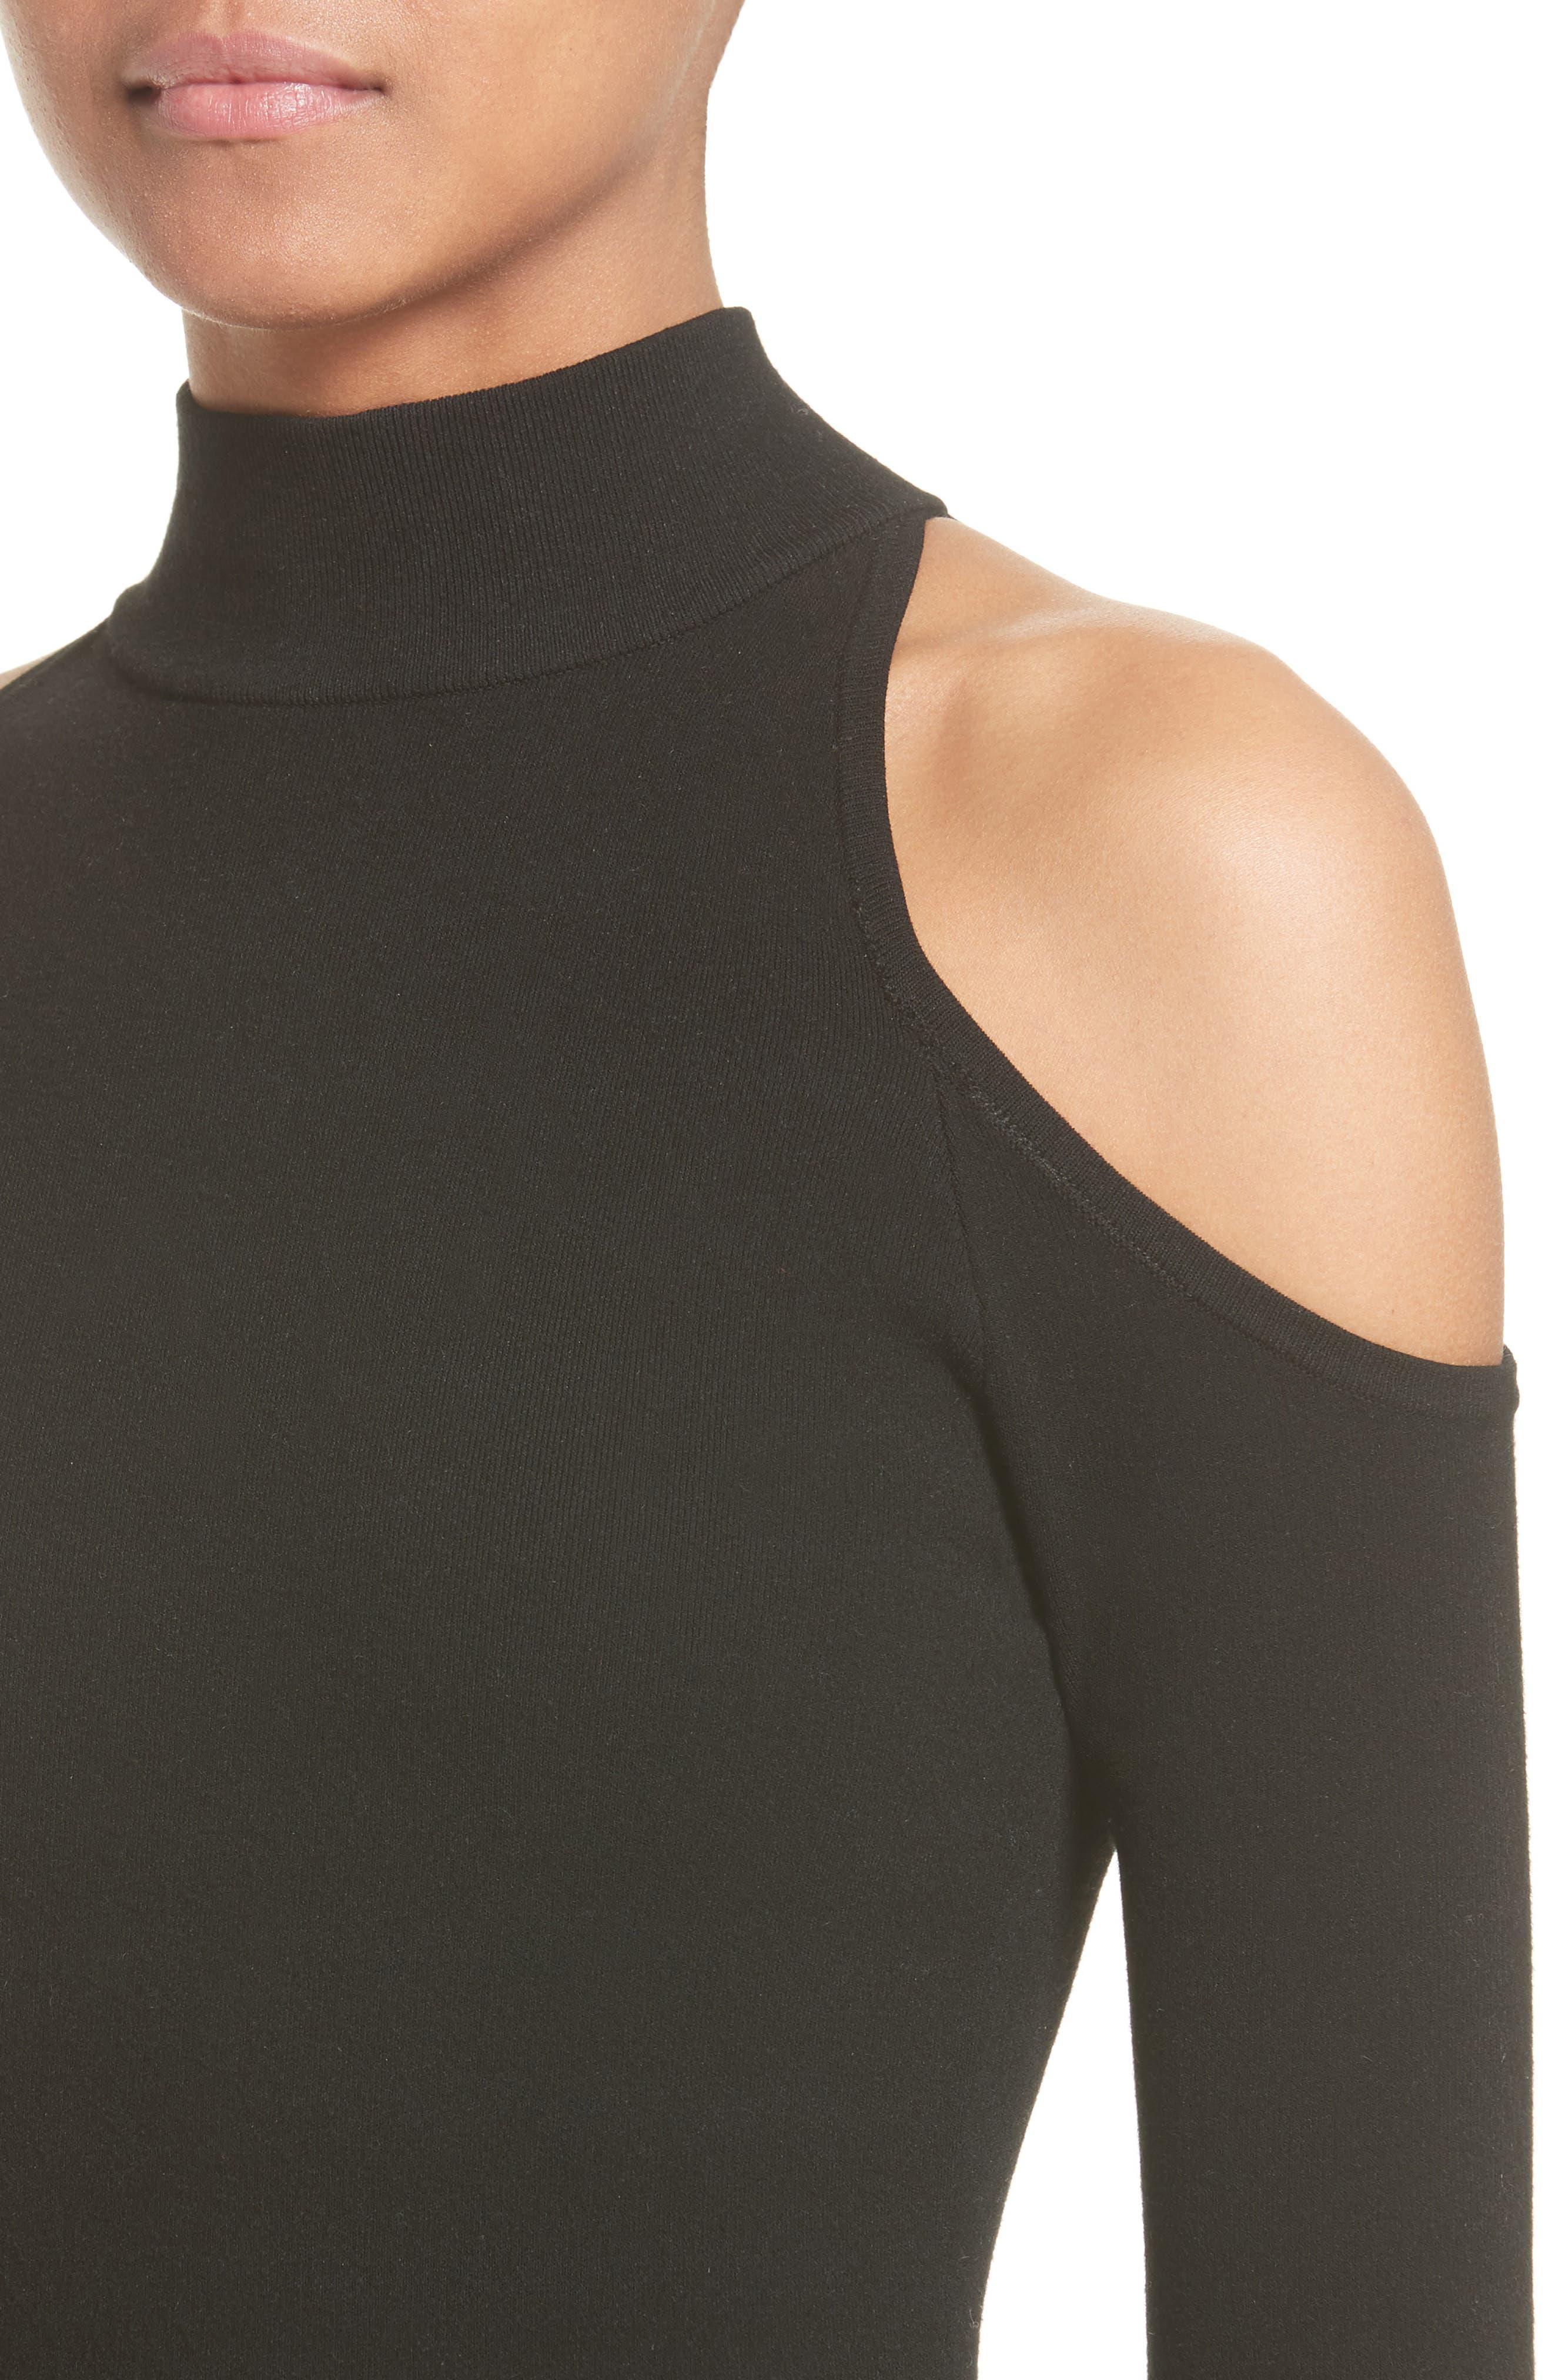 Cold Shoulder Stretch Knit Top,                             Alternate thumbnail 4, color,                             001